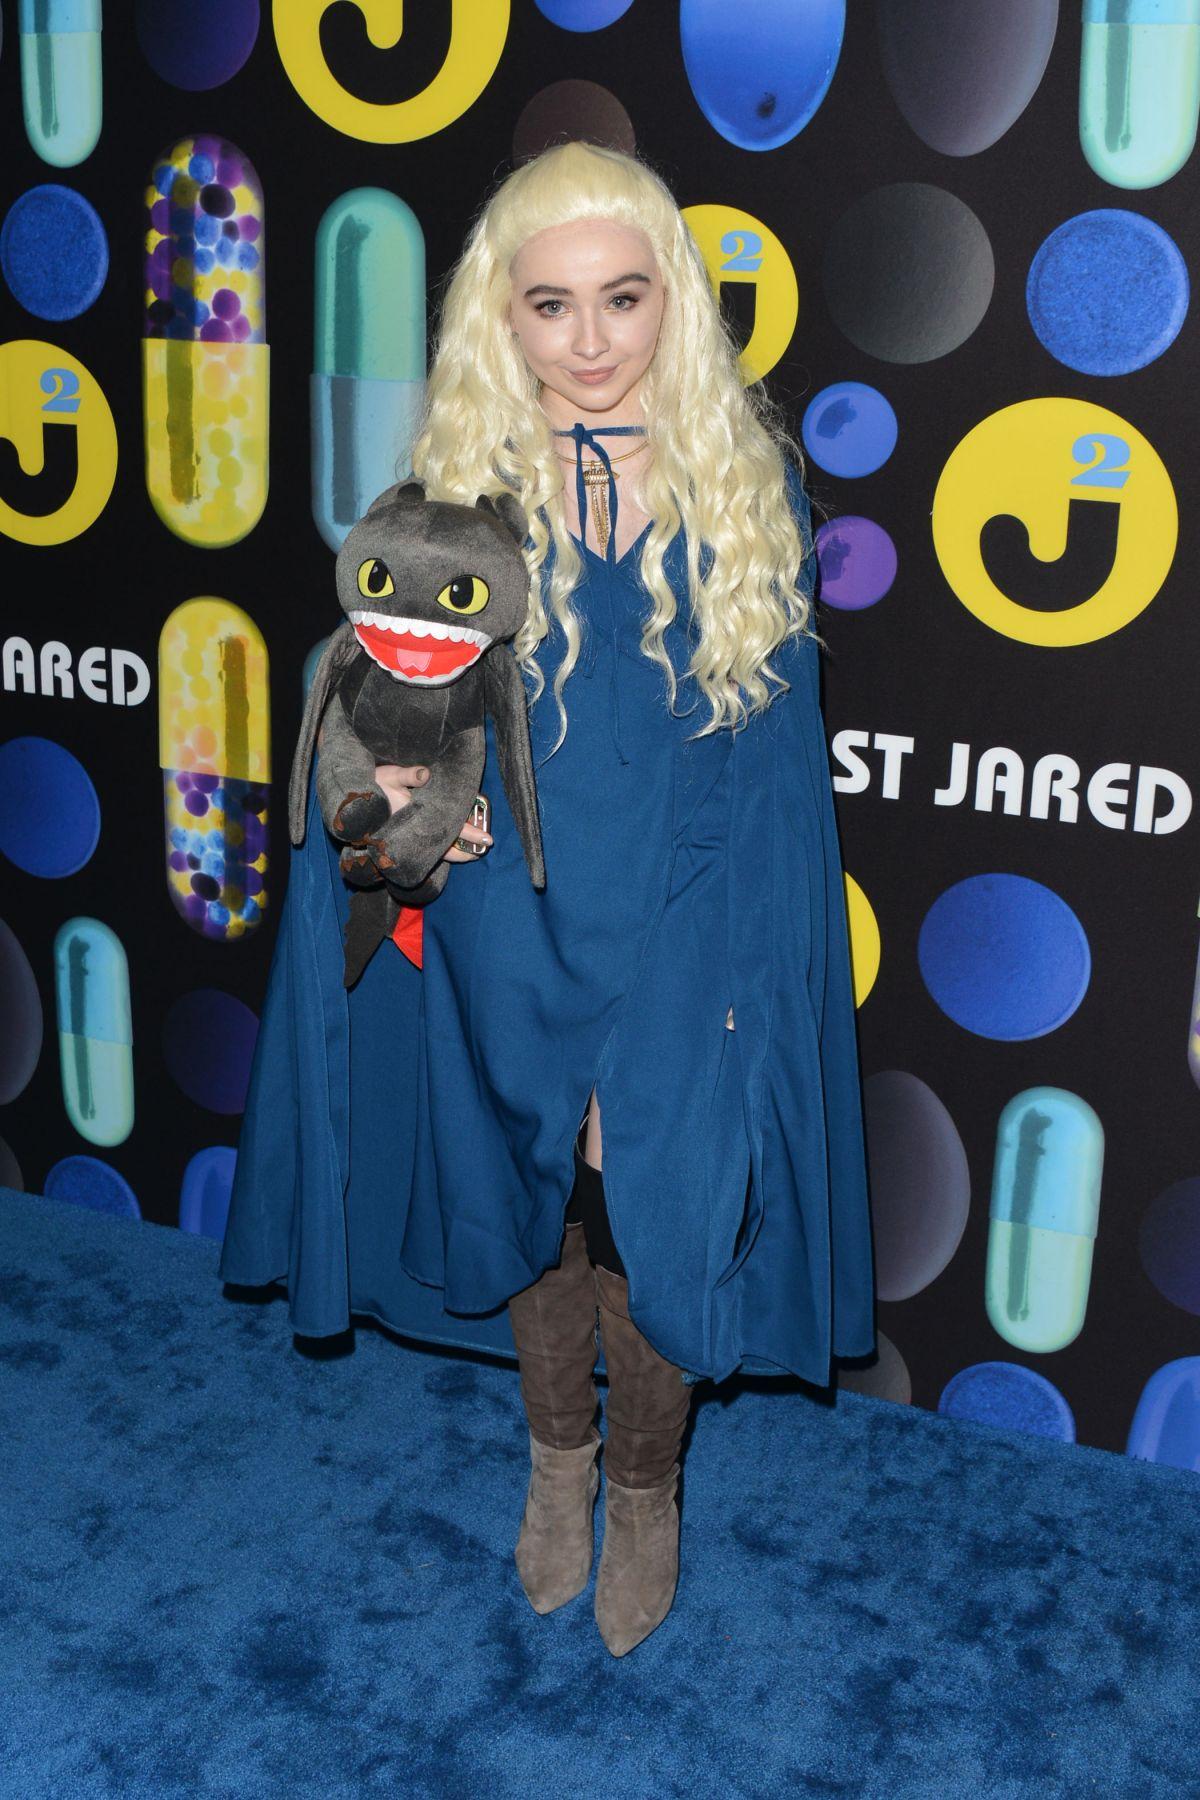 SABRINA CARPENTER at Just Jared Halloween Party in Hollywood 10/31 ...